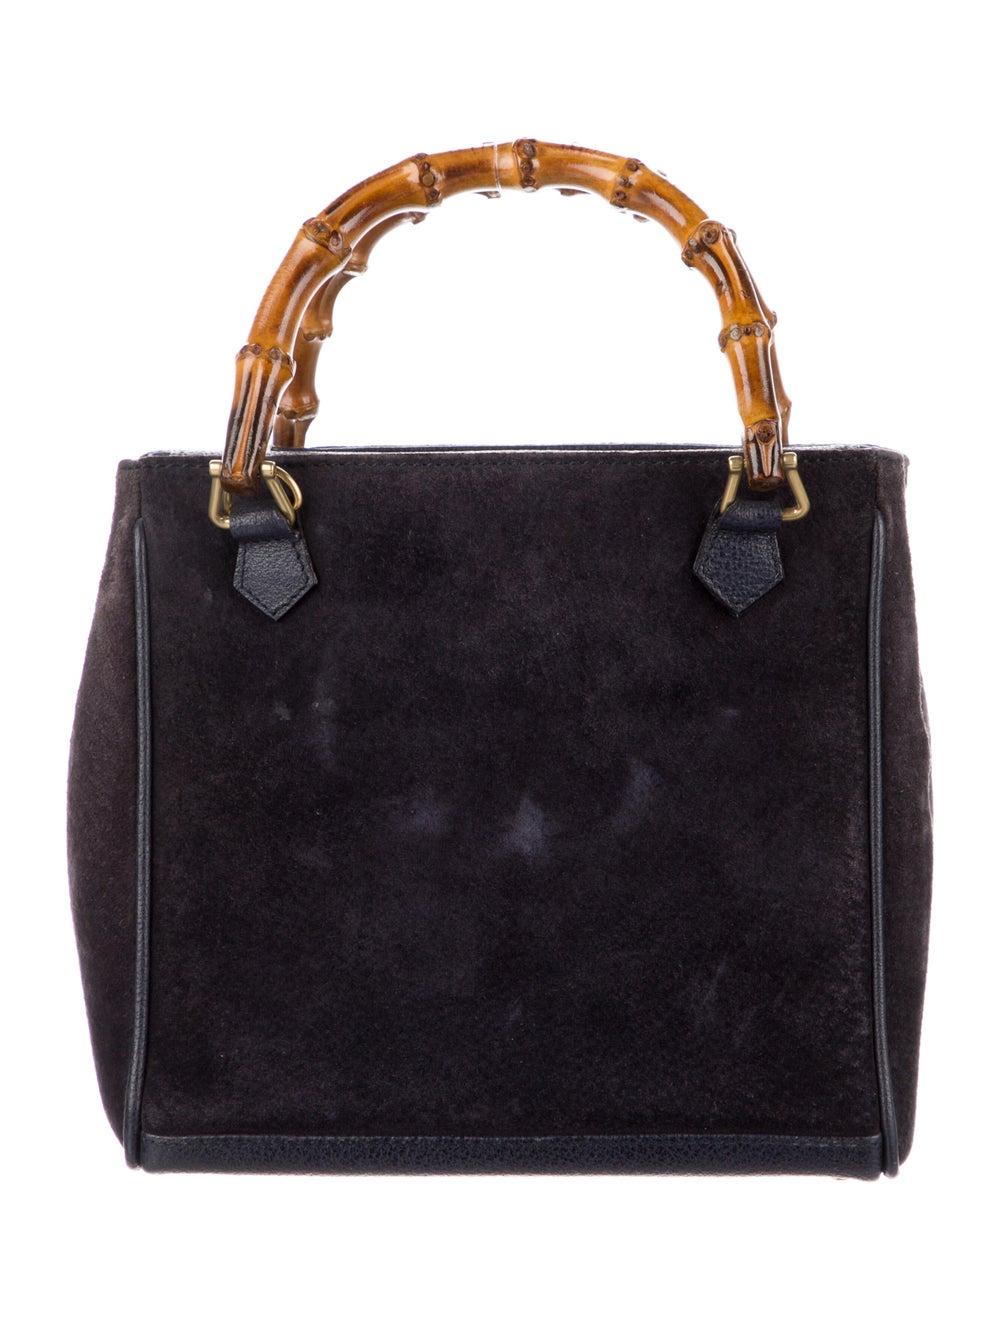 Gucci Vintage Mini Bamboo Handle Bag Blue - image 4